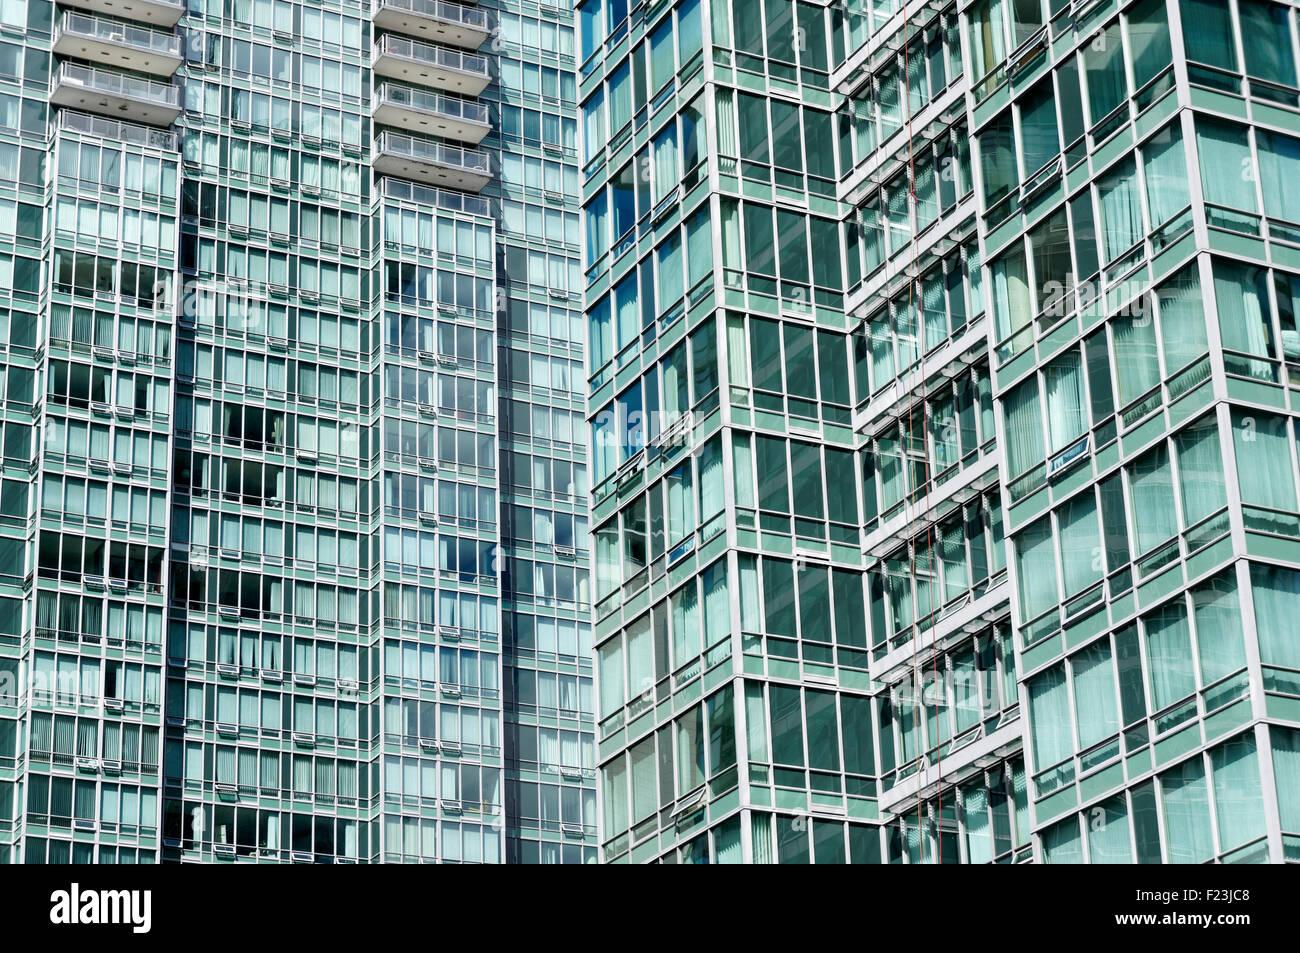 closeup-of-a-modern-glass-high-rise-resi